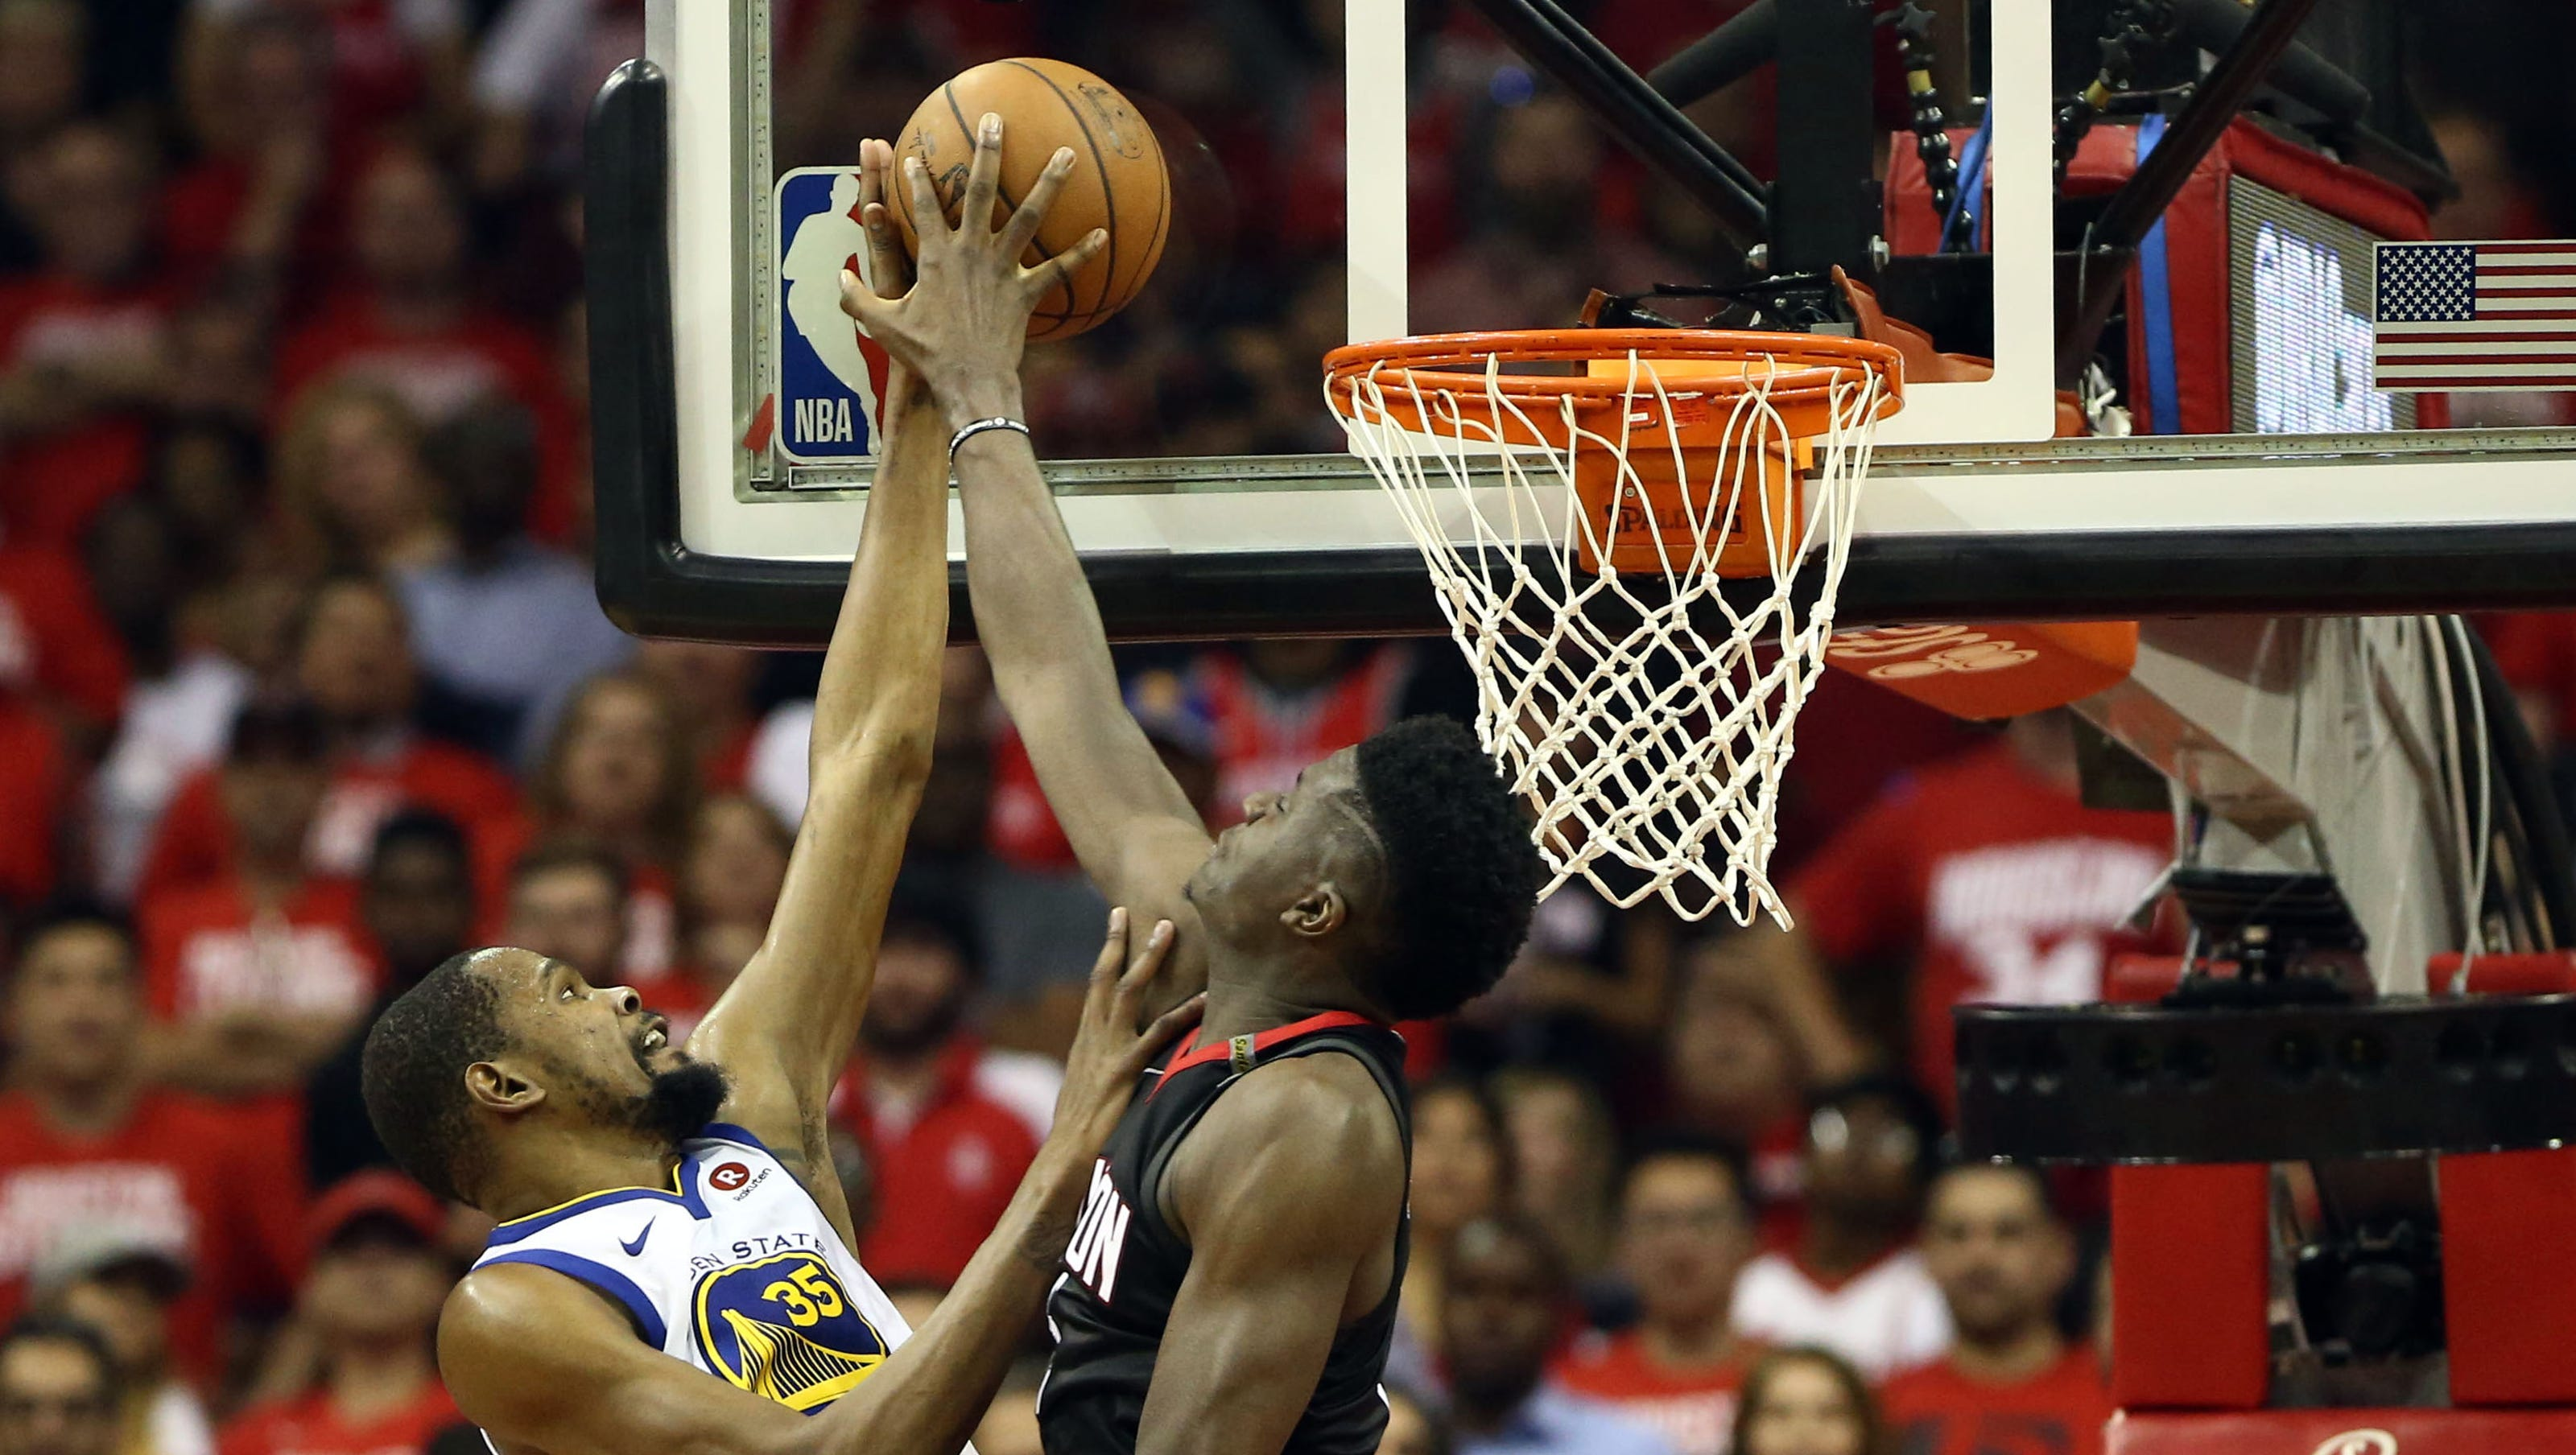 Game 7 predictions: Can Rockets halt Warriors' dynasty?